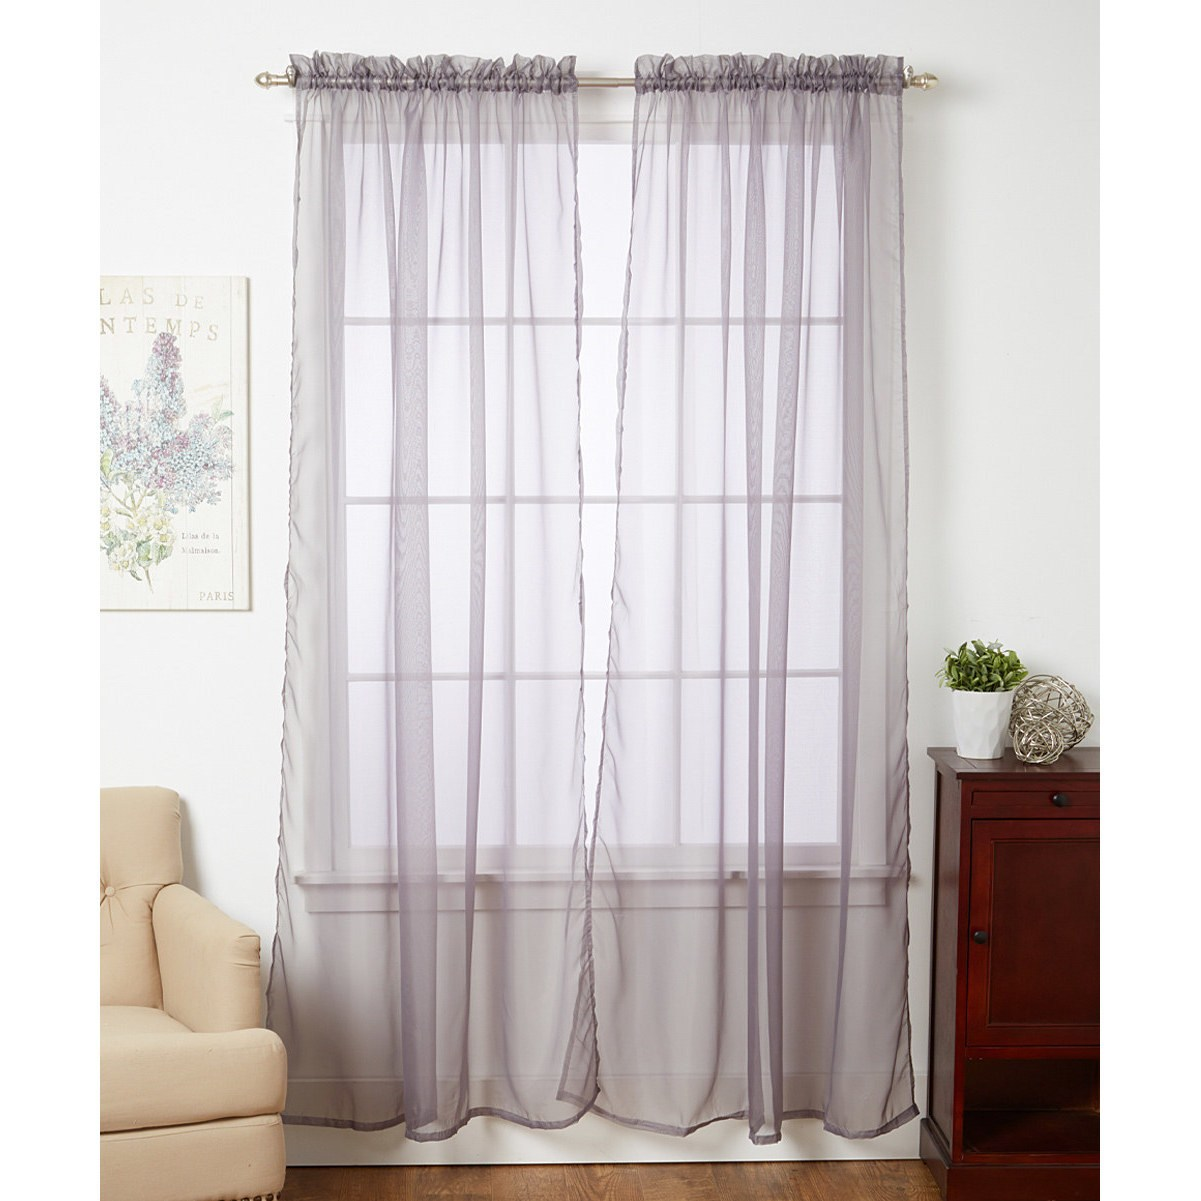 J TEXTILES Linda Sheer Voile 4 Pack Window Curtain Panel ...